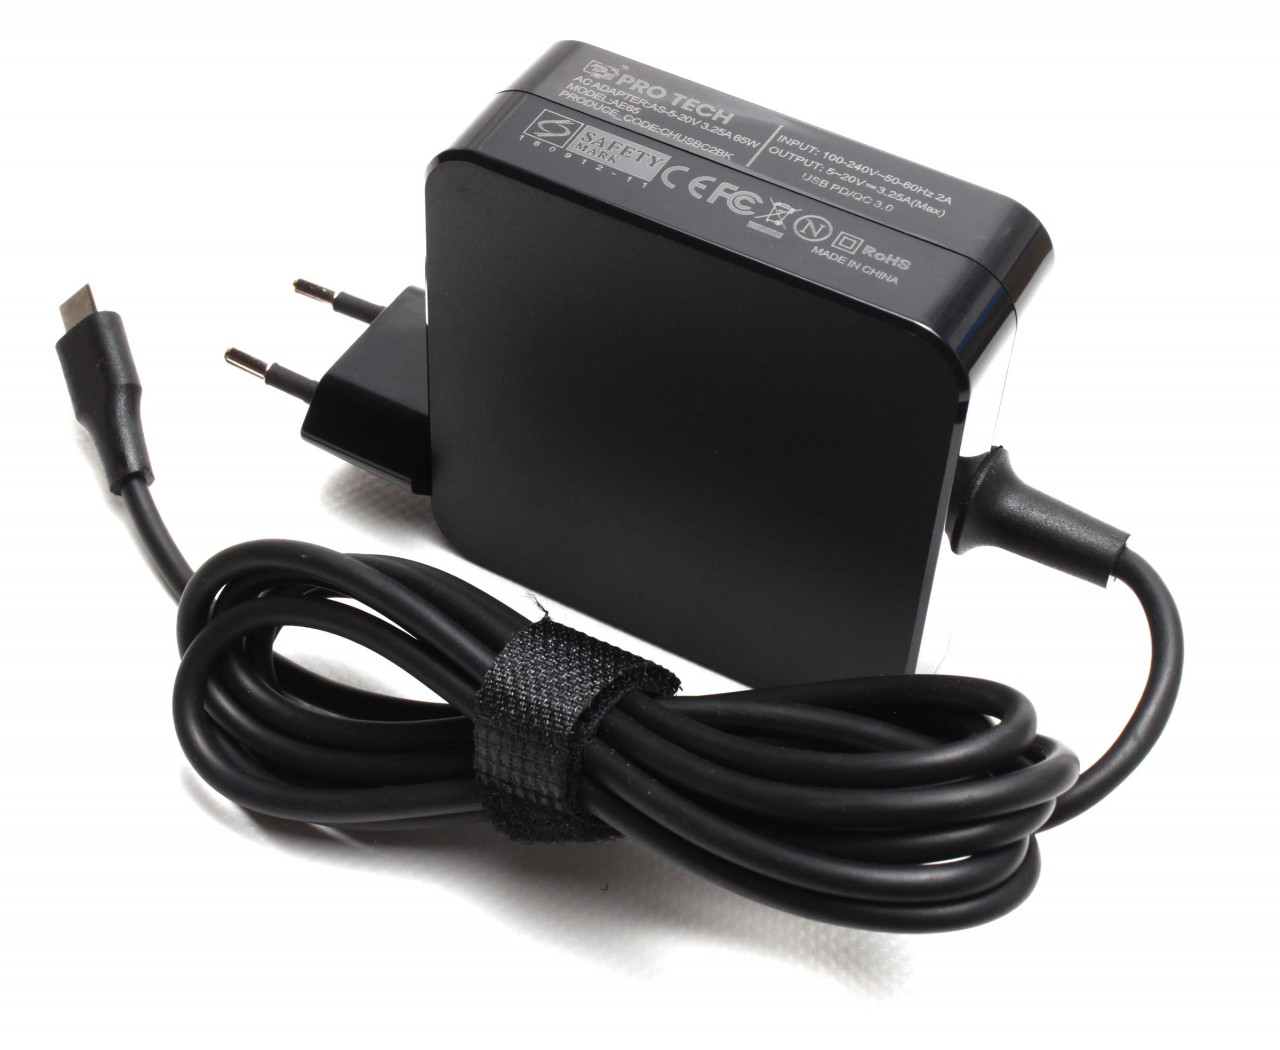 Incarcator Apple MJ262CH/A 65W Replacement imagine powerlaptop.ro 2021